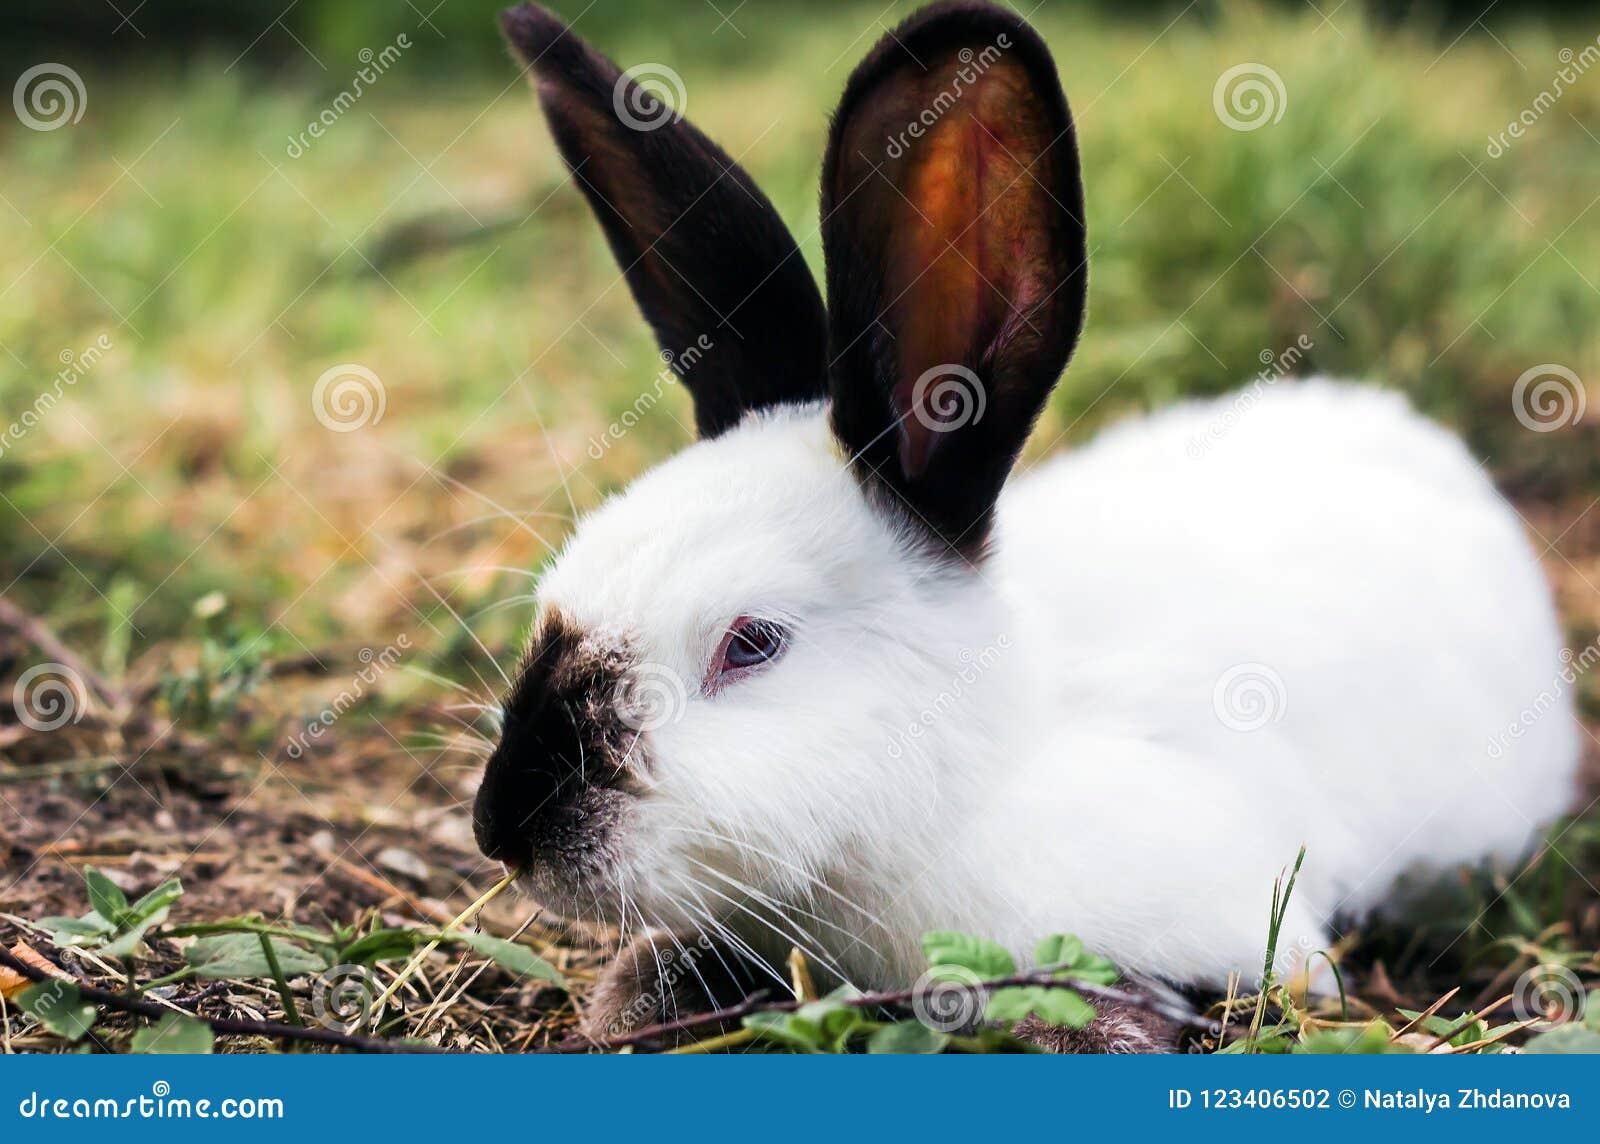 Animais selvagens na natureza, coelho branco na grama